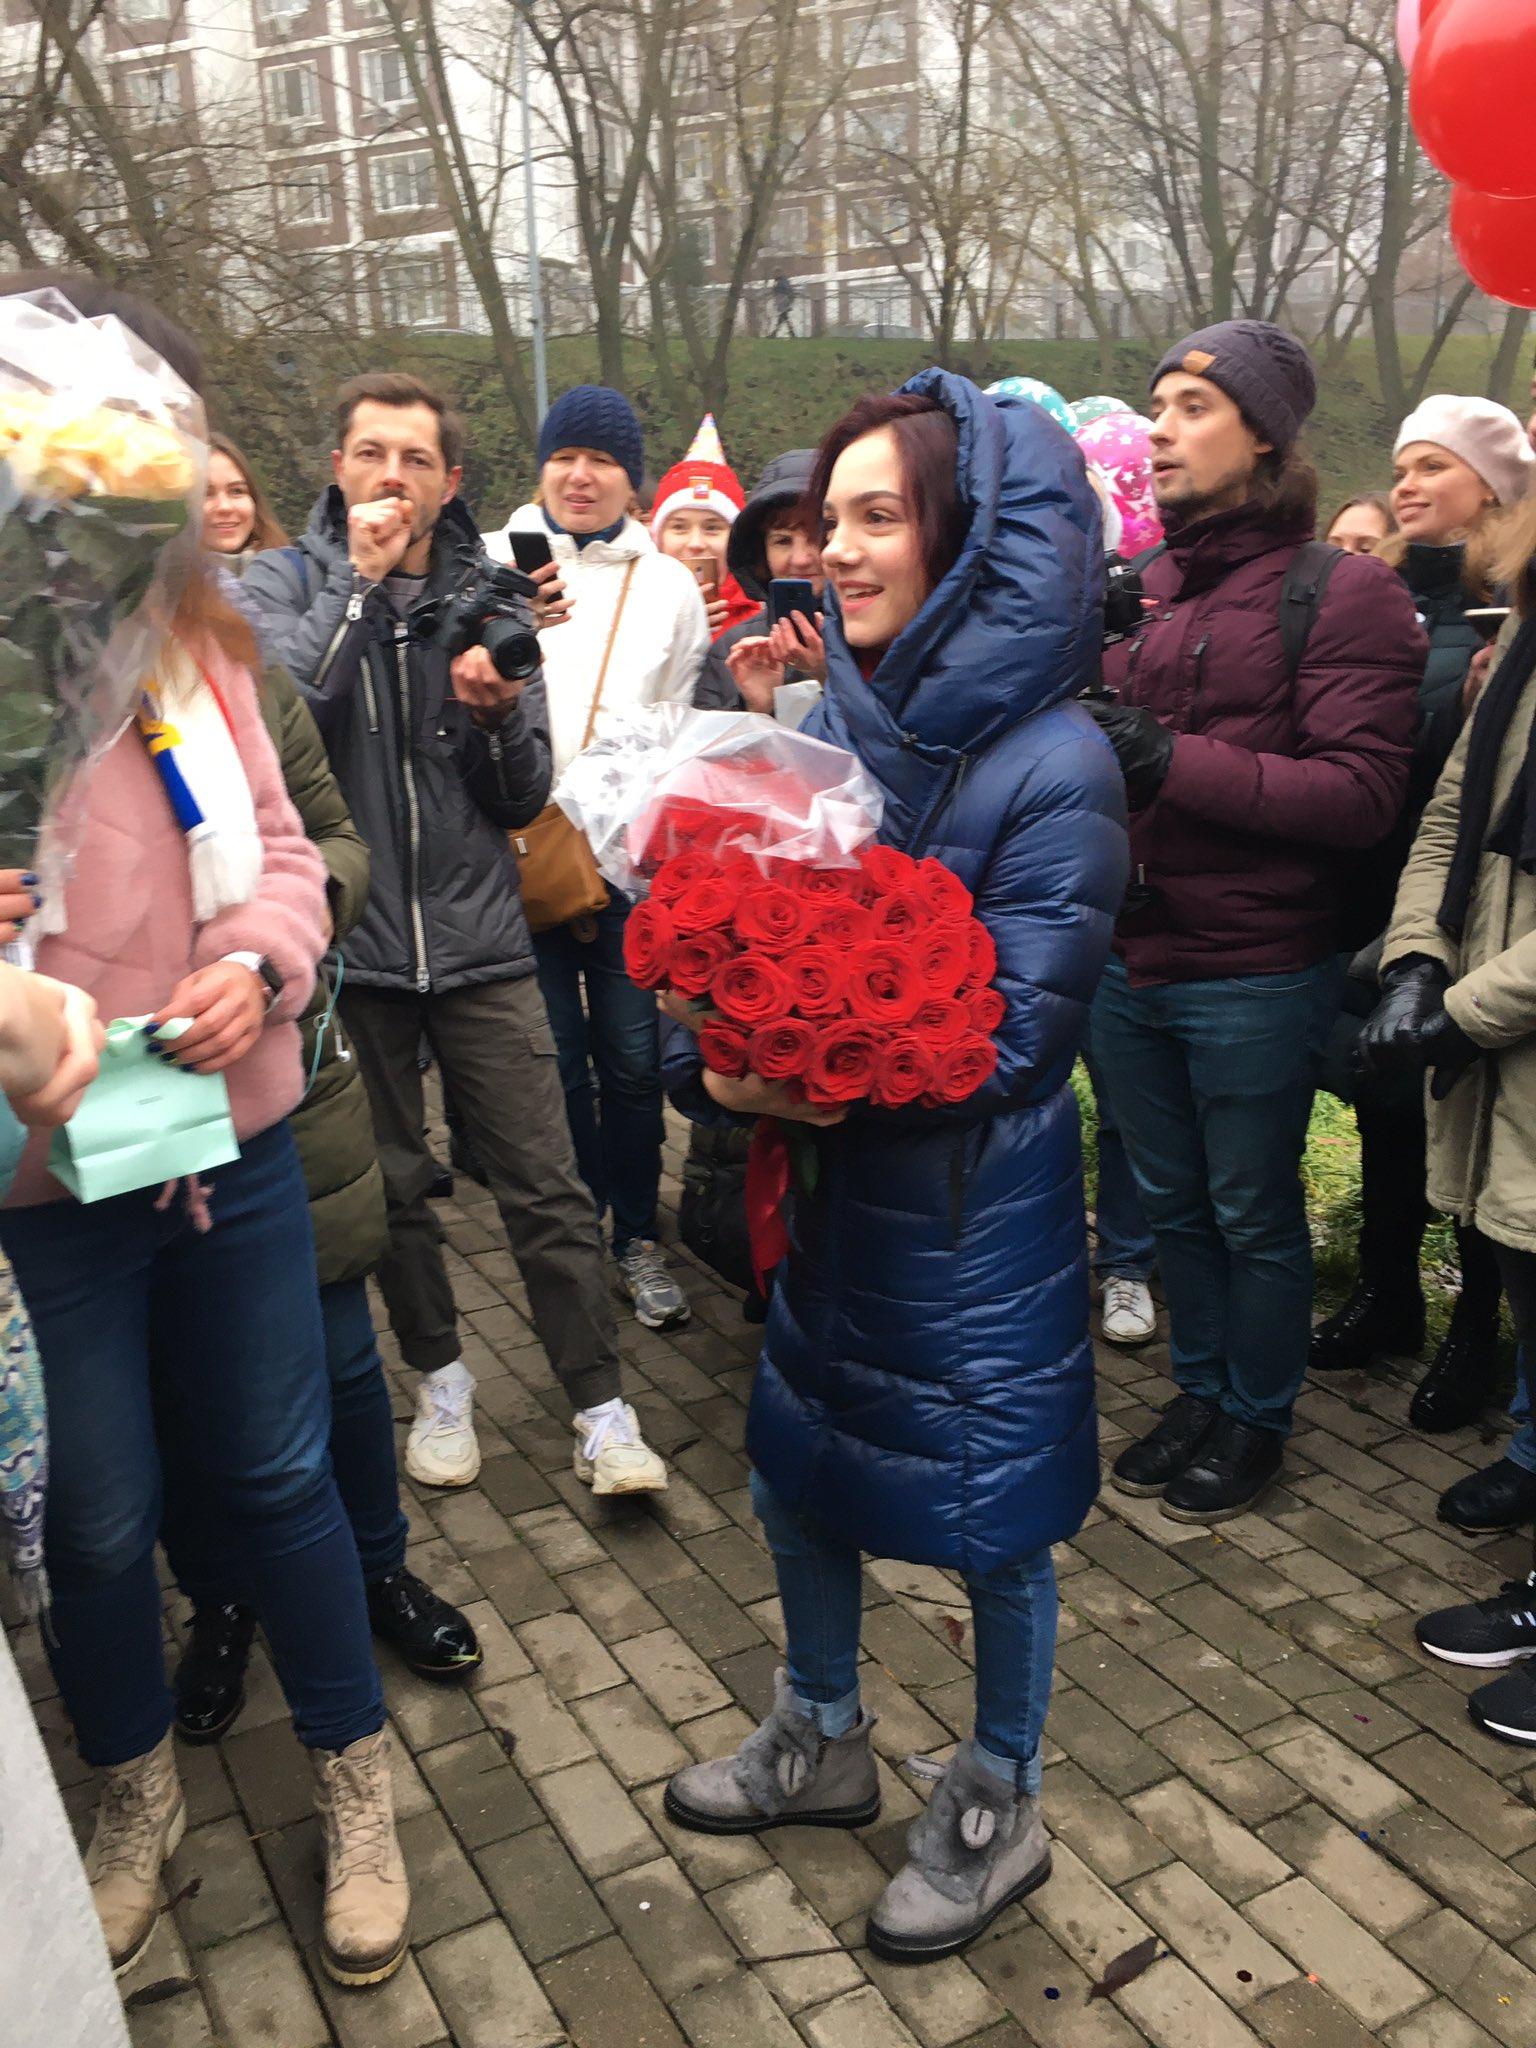 Evgenia Medvedeva | Медведева Евгения Армановна-6 - Страница 9 EJuHKX2XkAAVmmr?format=jpg&name=4096x4096